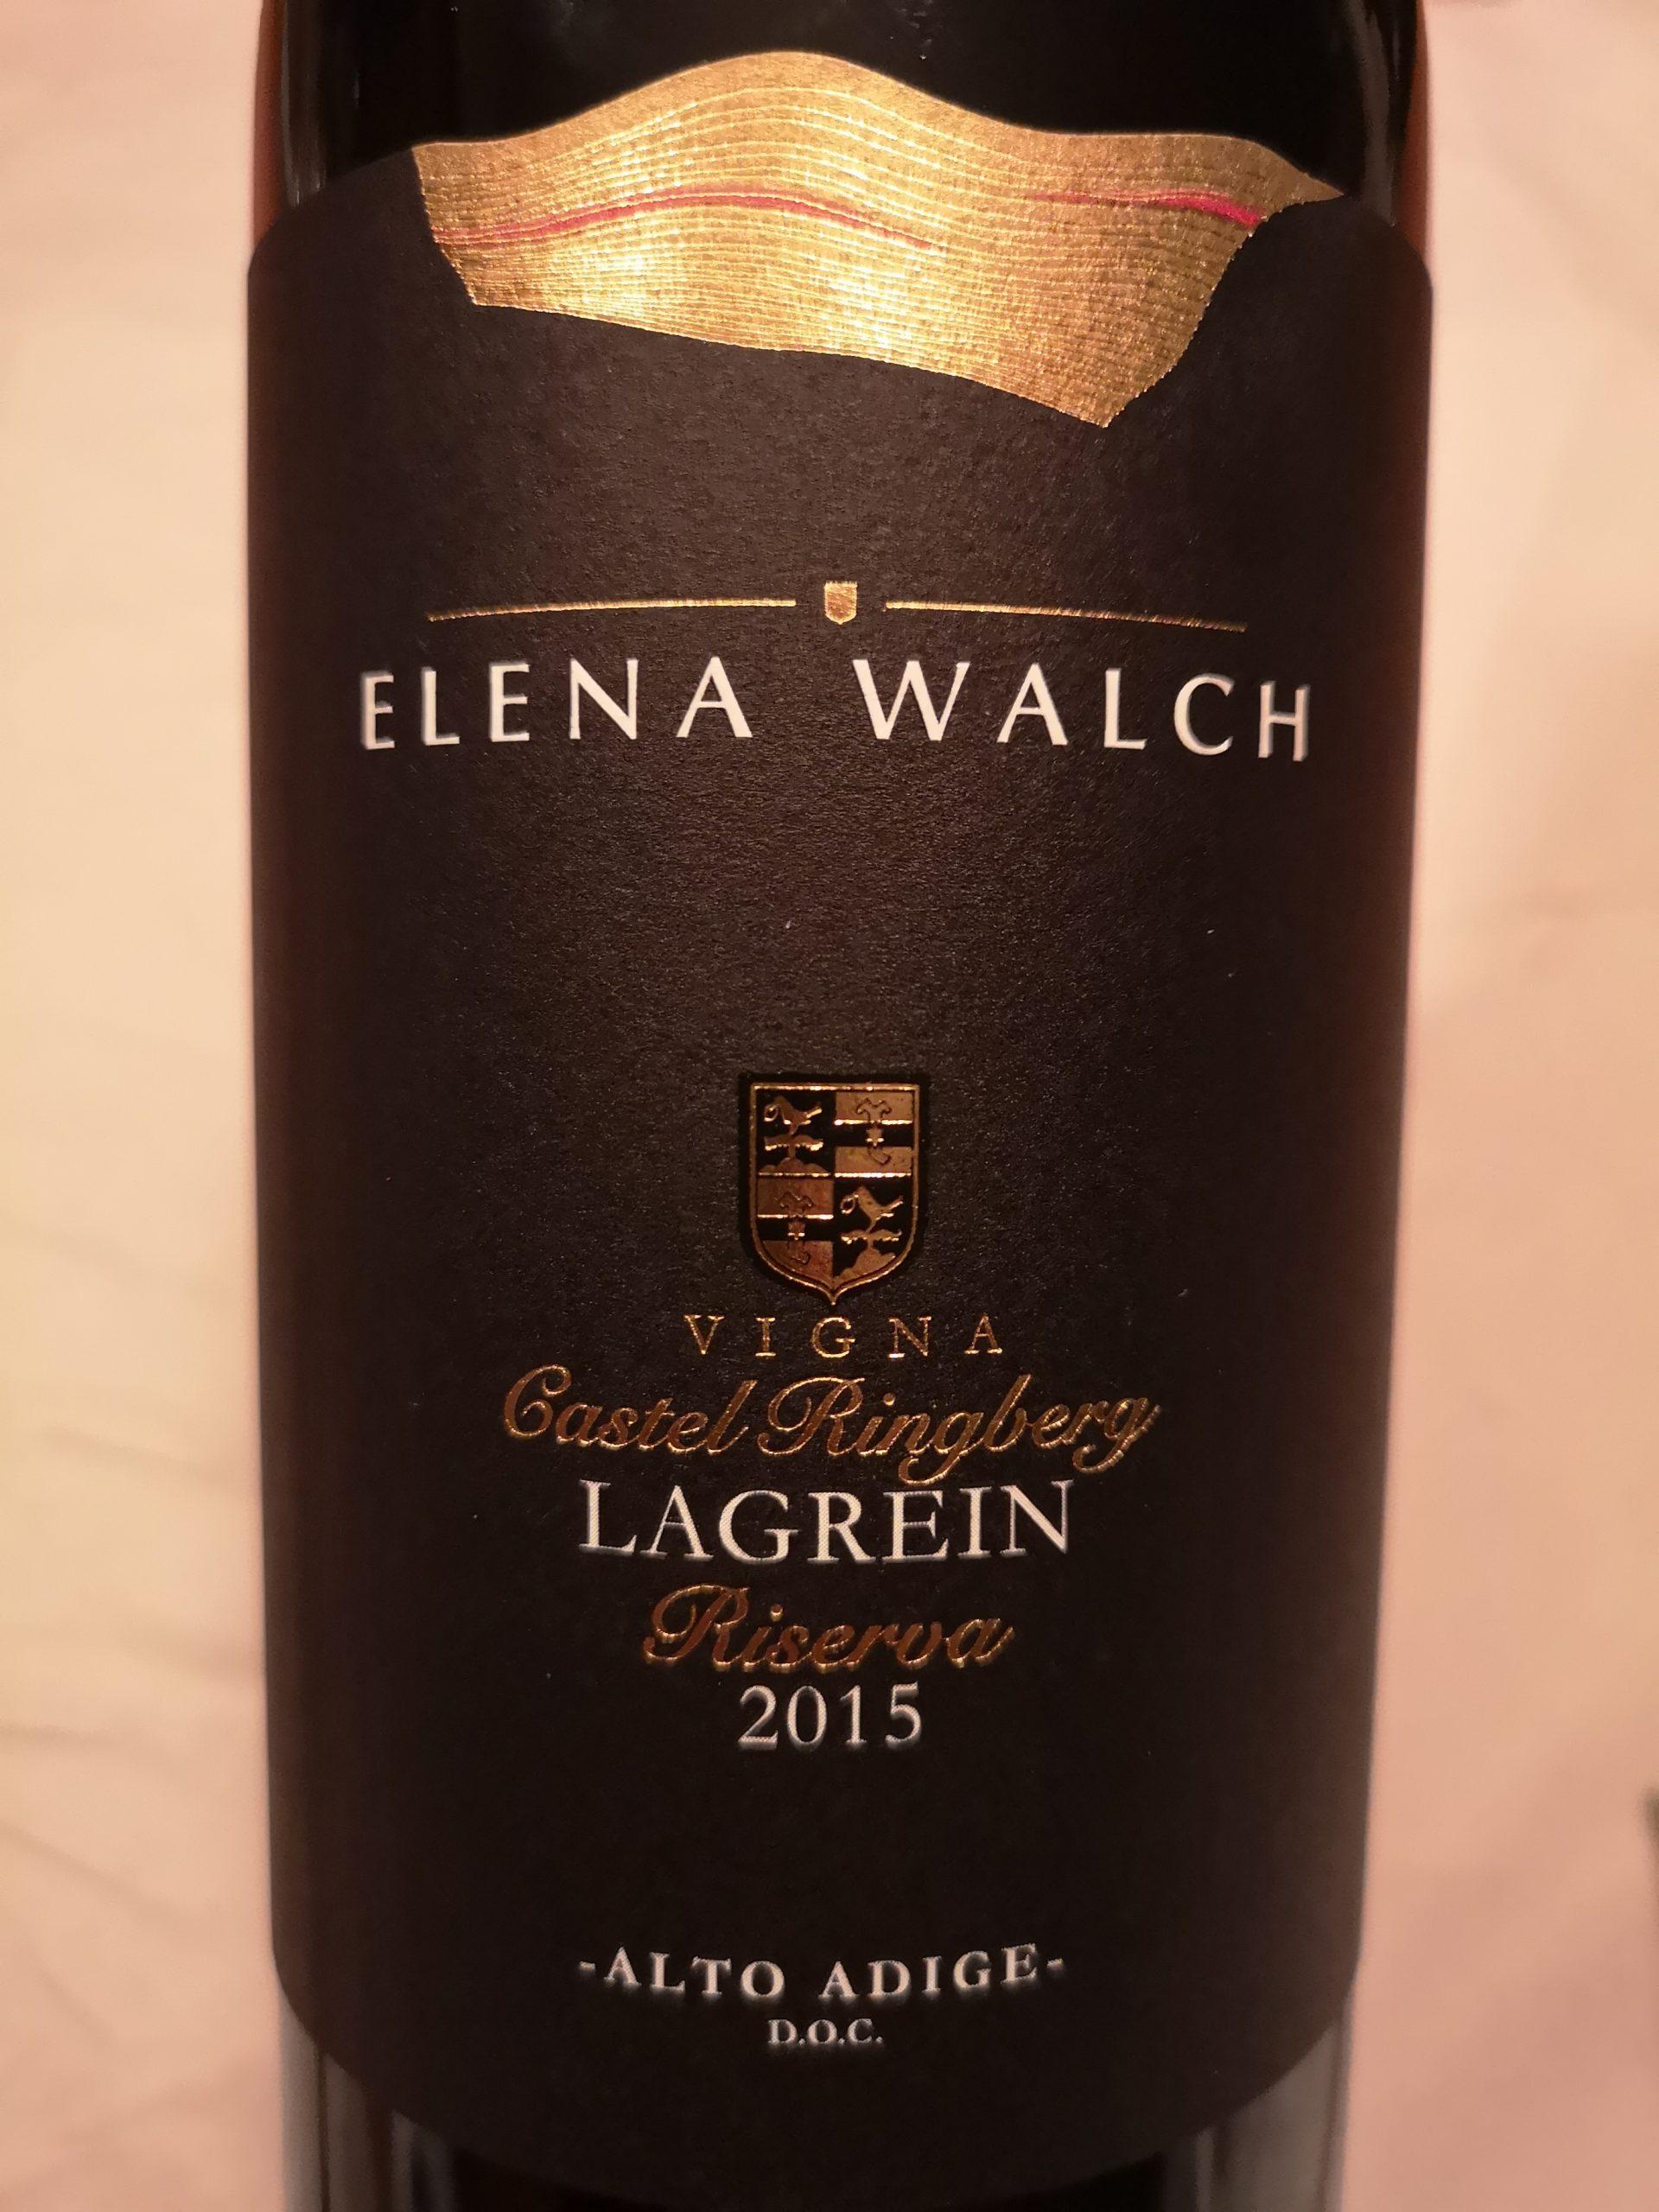 2015 Lagrein Riserva Castel Ringberg | Elena Walch